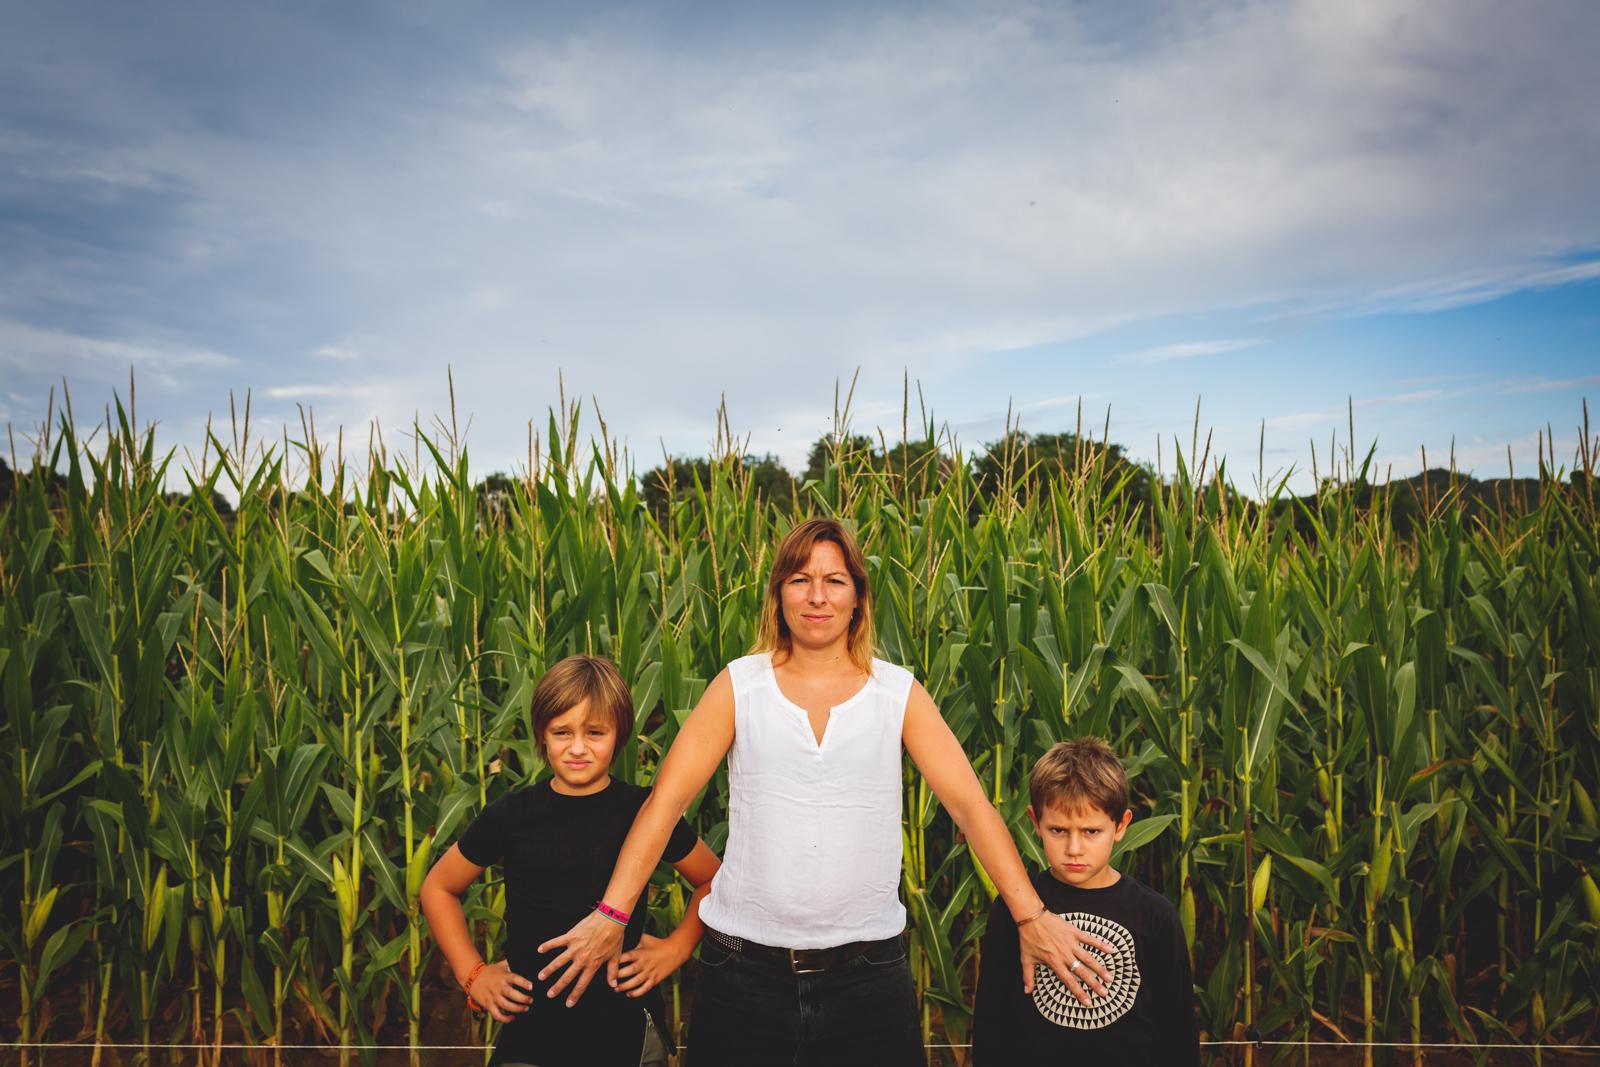 los-niños-del-maiz-family-photographer-barcelona-misshappyflash-4jpg